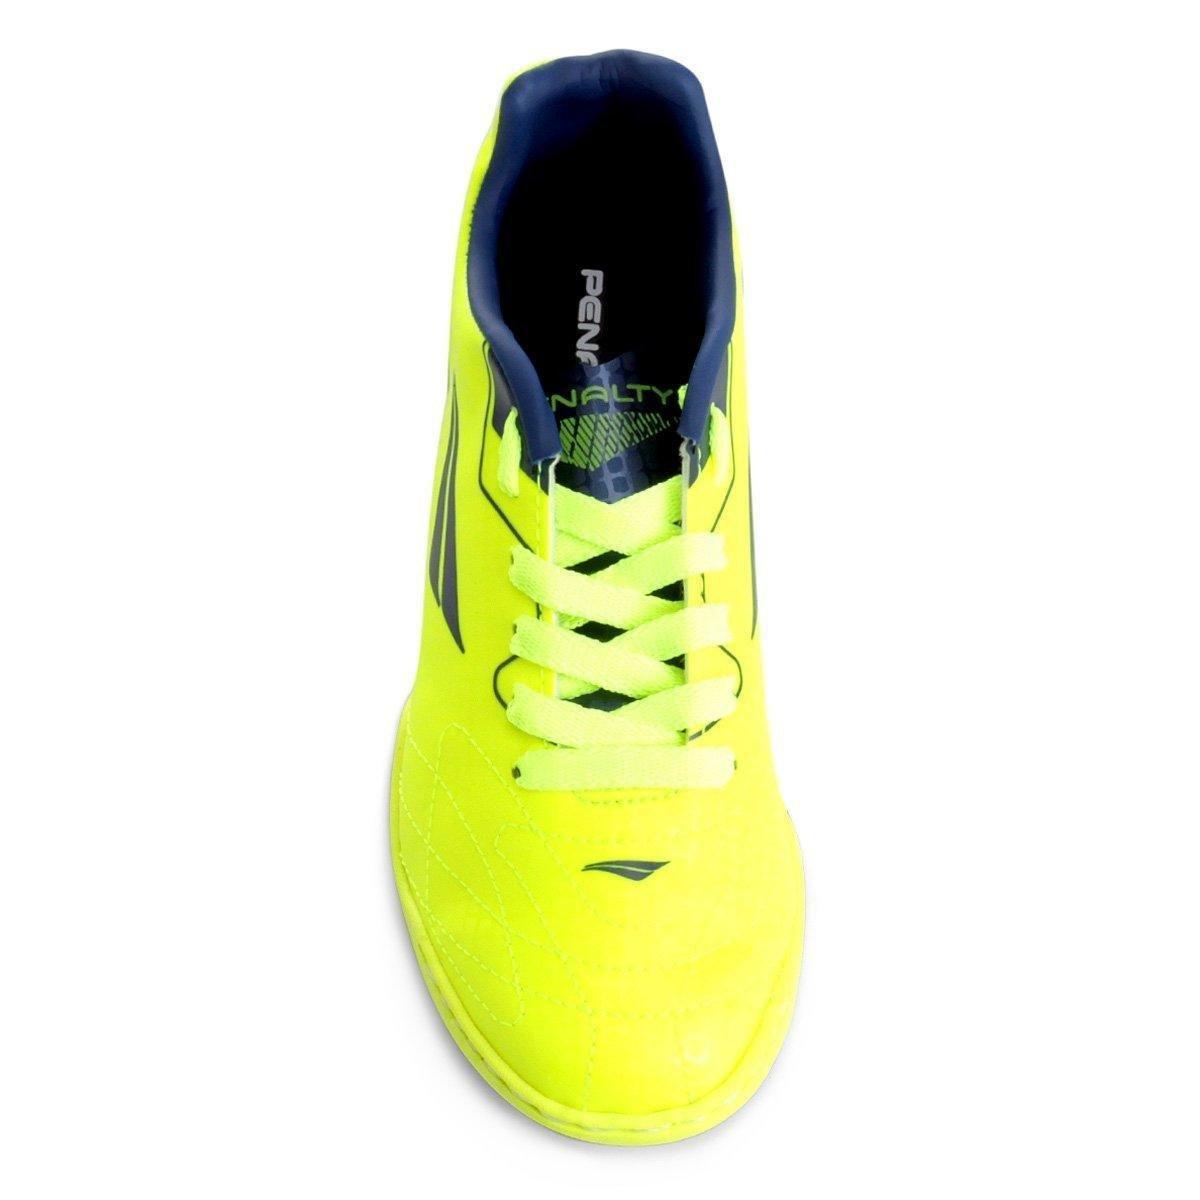 d508bb99ff Chuteira Society Infantil Penalty Soccer Matis VIII - Amarelo e Azul ...